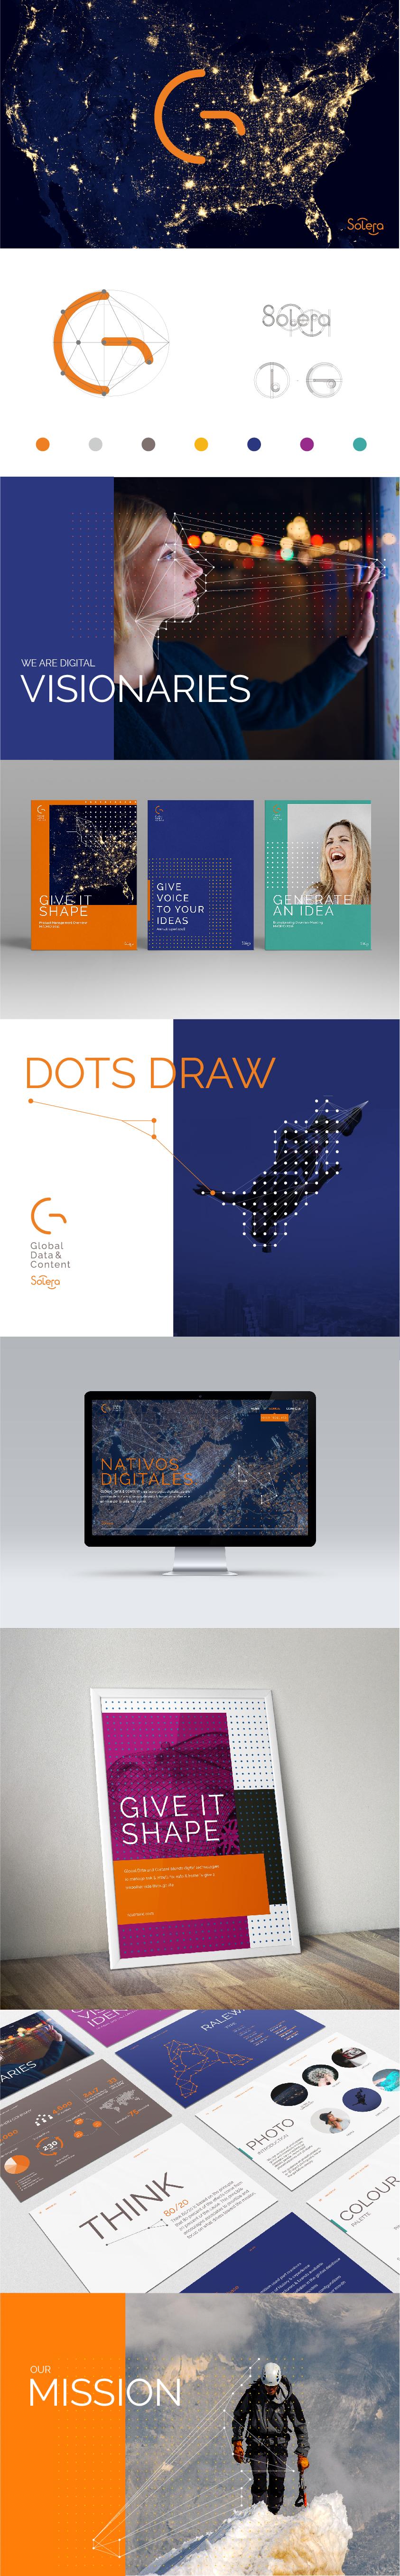 global-data-&-content-solera